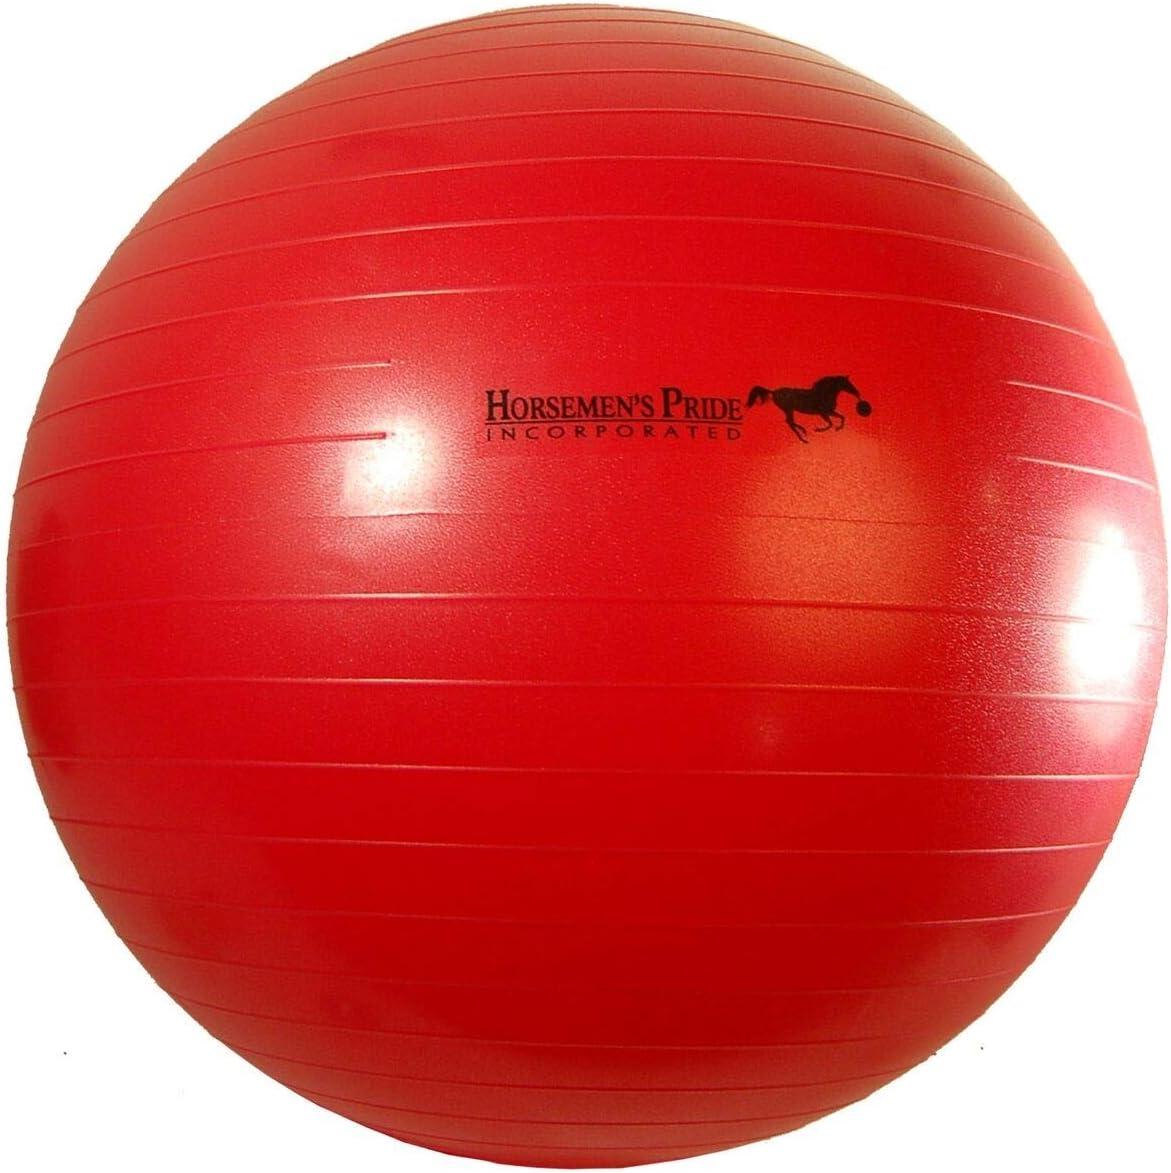 Horsemens Pride Mega Ball Horse and Dog Toy